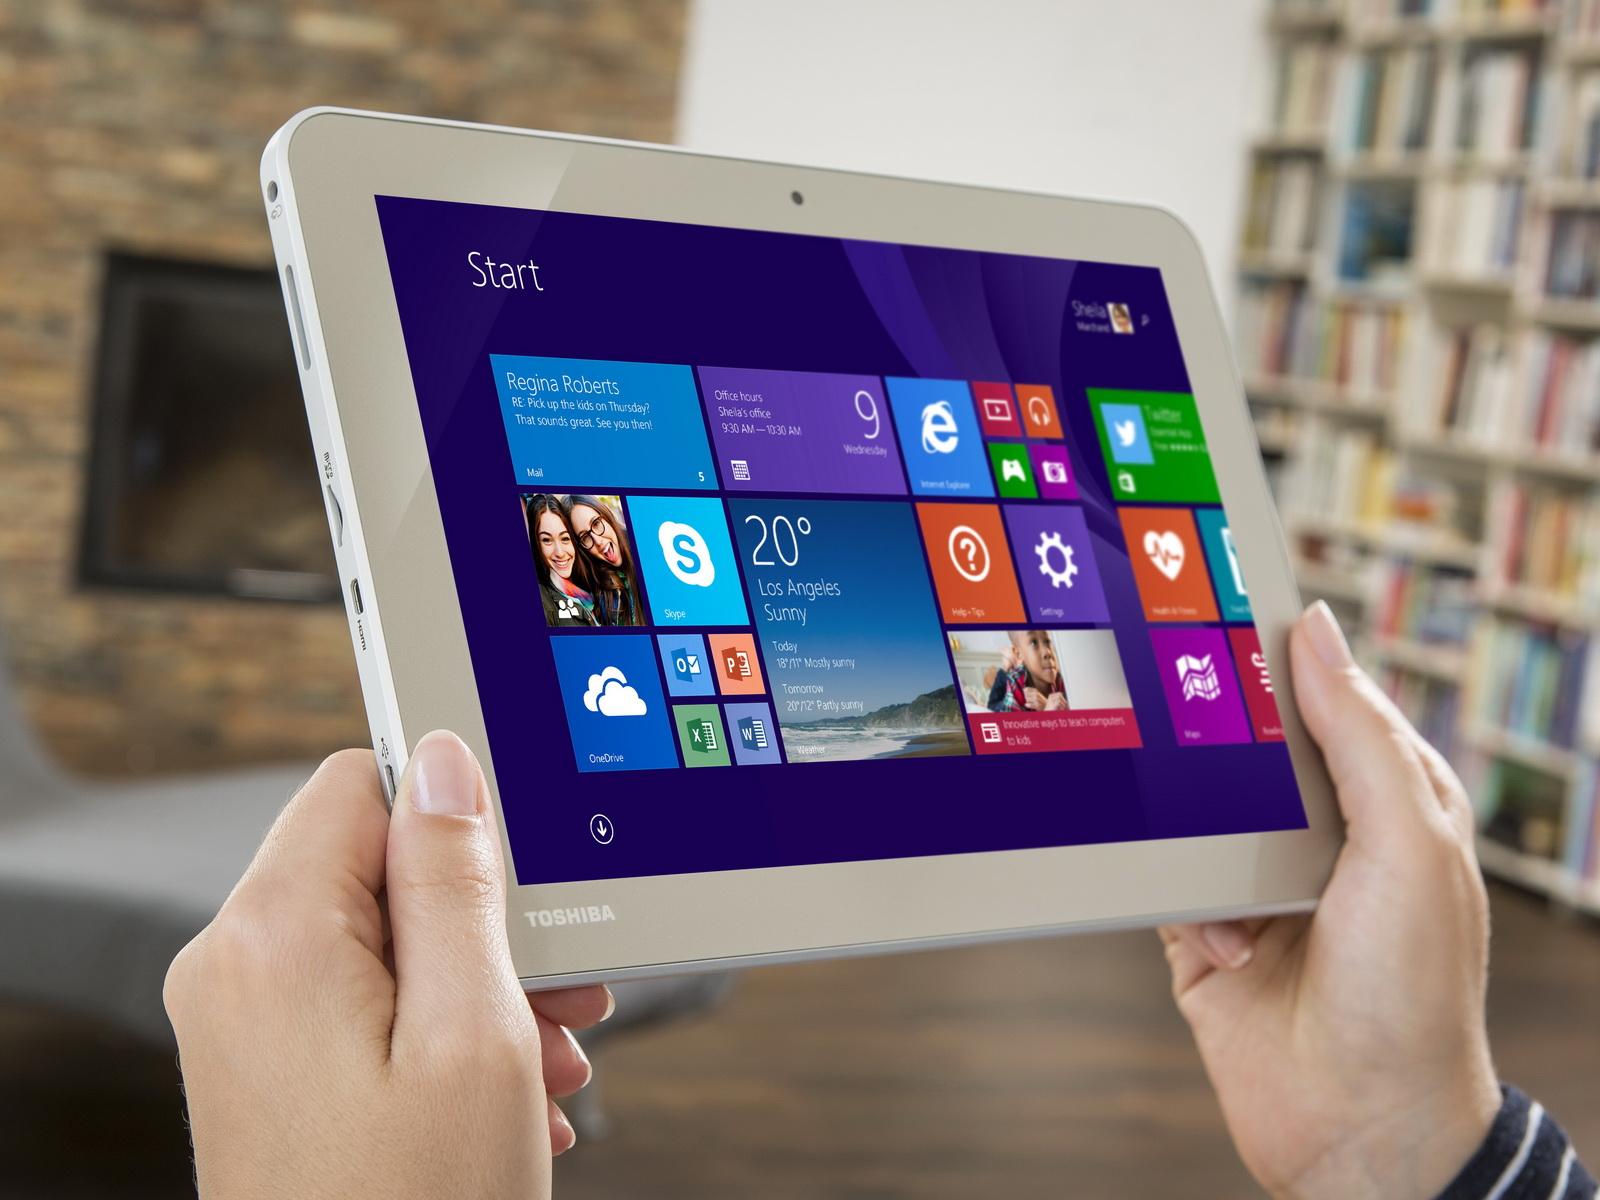 toshiba windows 8 1 tablet encore 2 wt10 a 106 mit bluetooth tastatur news. Black Bedroom Furniture Sets. Home Design Ideas